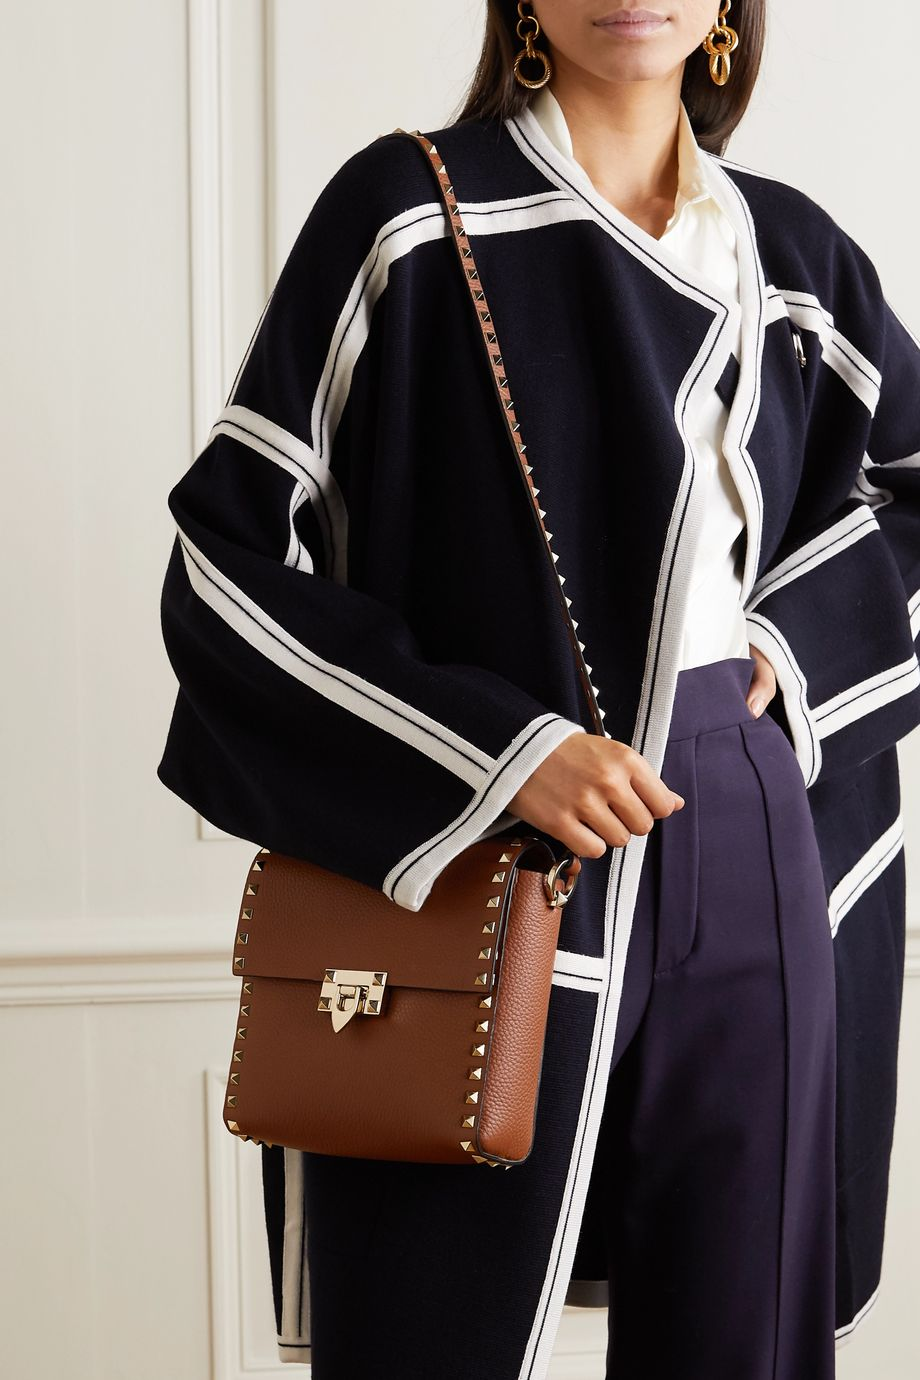 Valentino Valentino Garavani Rockstud small textured-leather shoulder bag